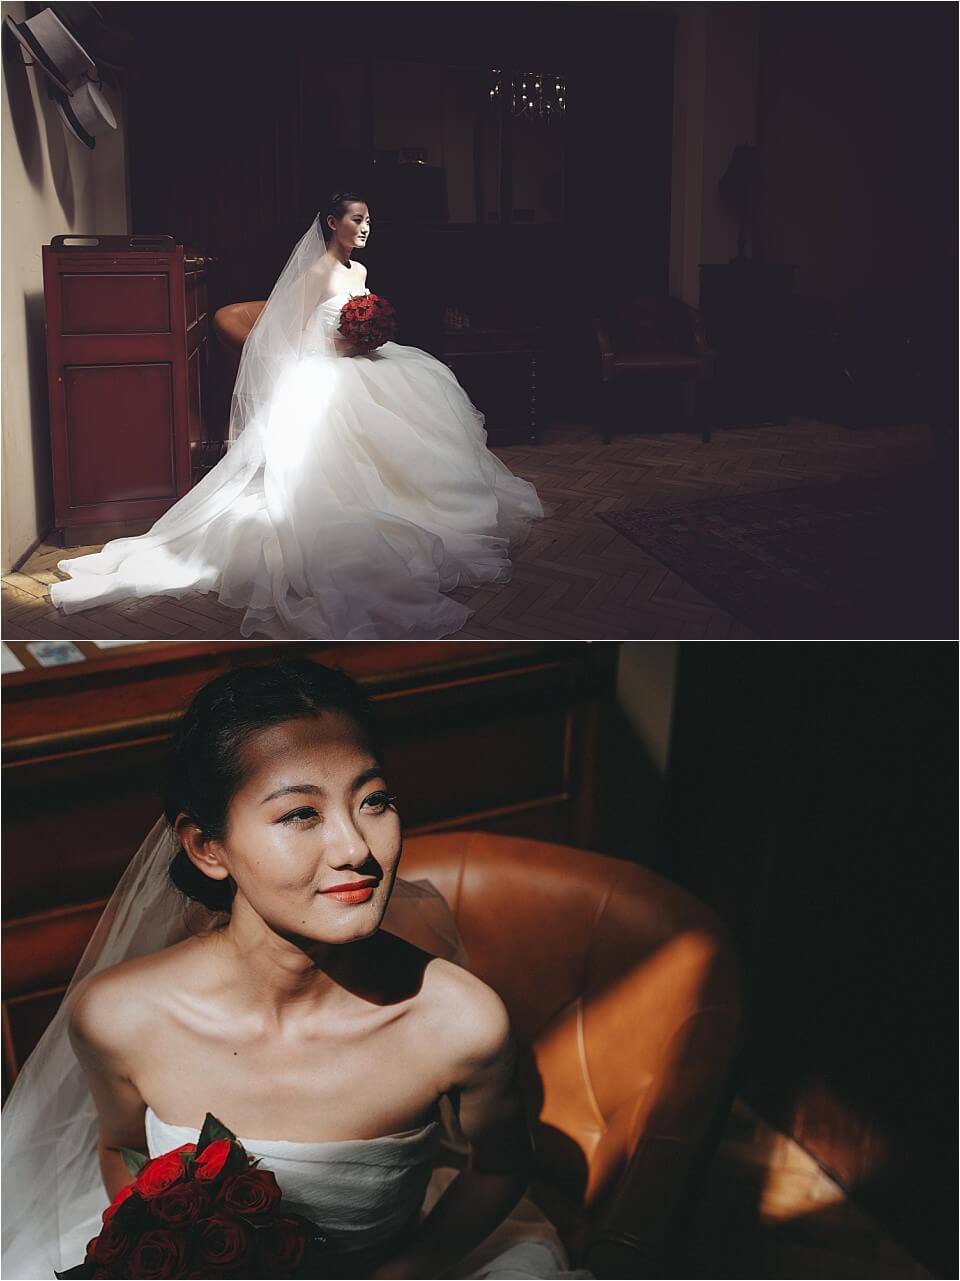 Reportage Wedding Photos